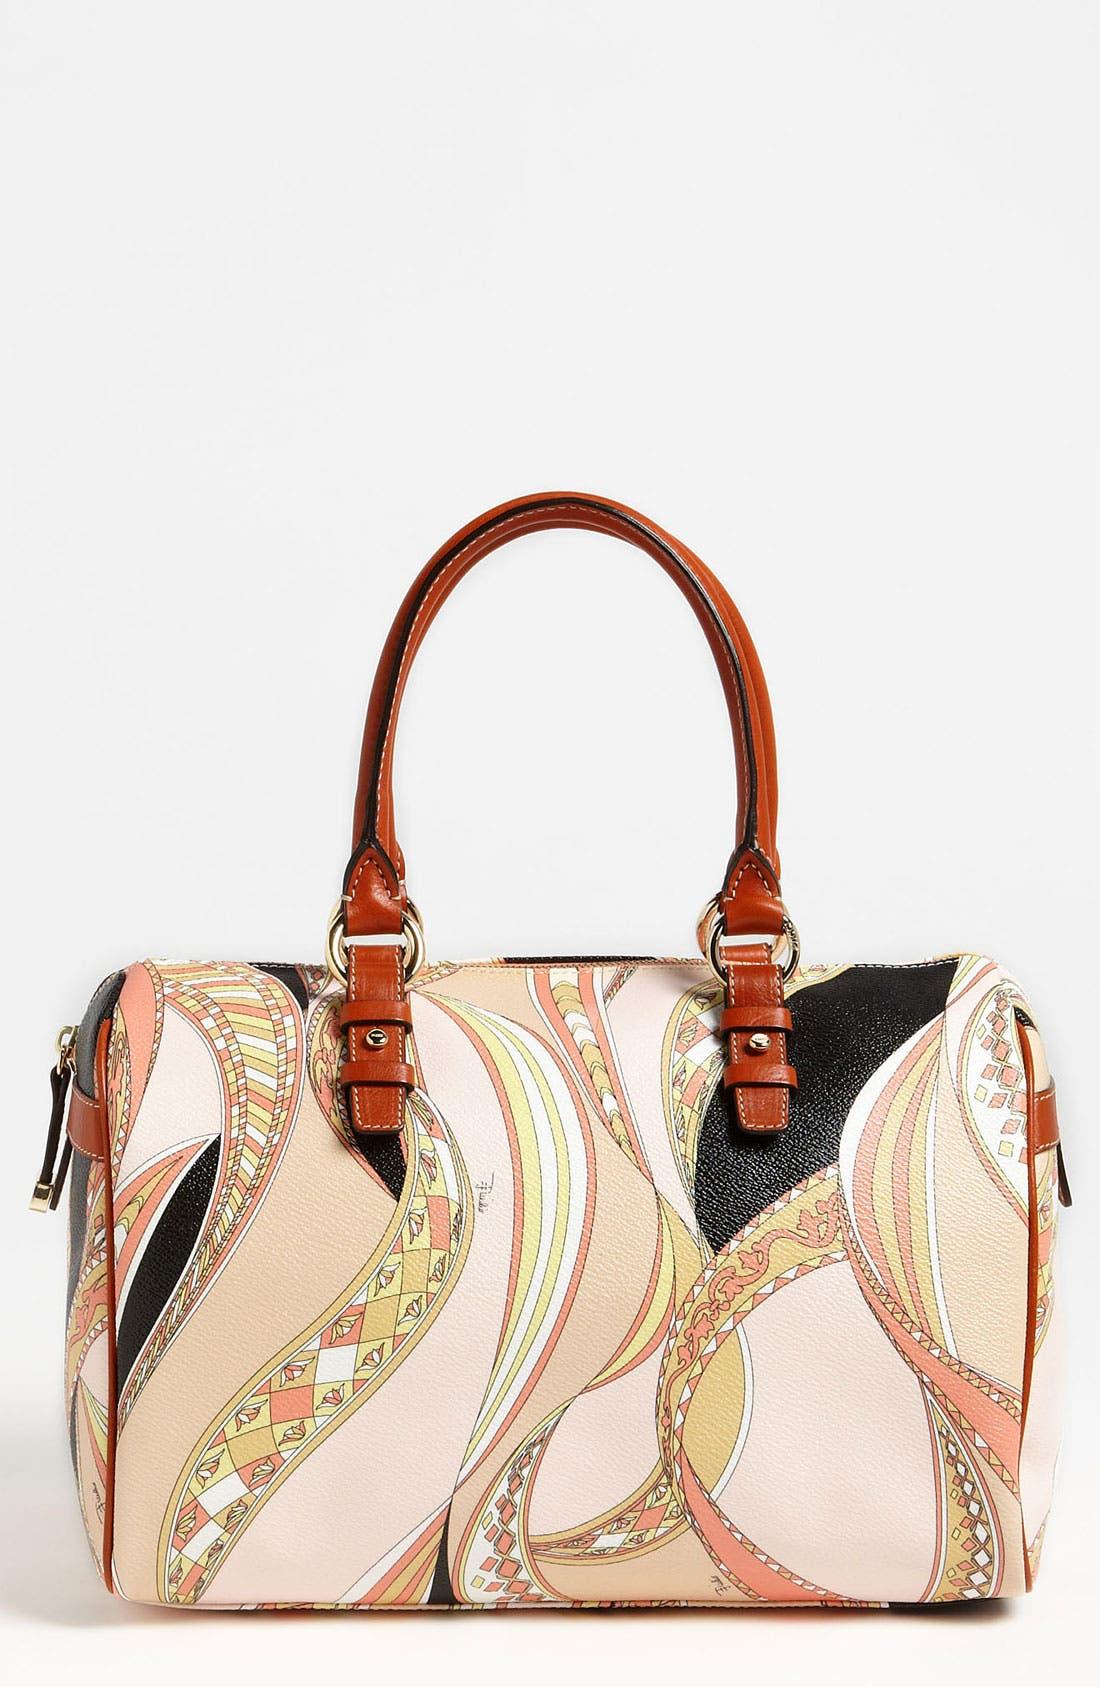 Main Image - Emilio Pucci 'Large' Boston Bag